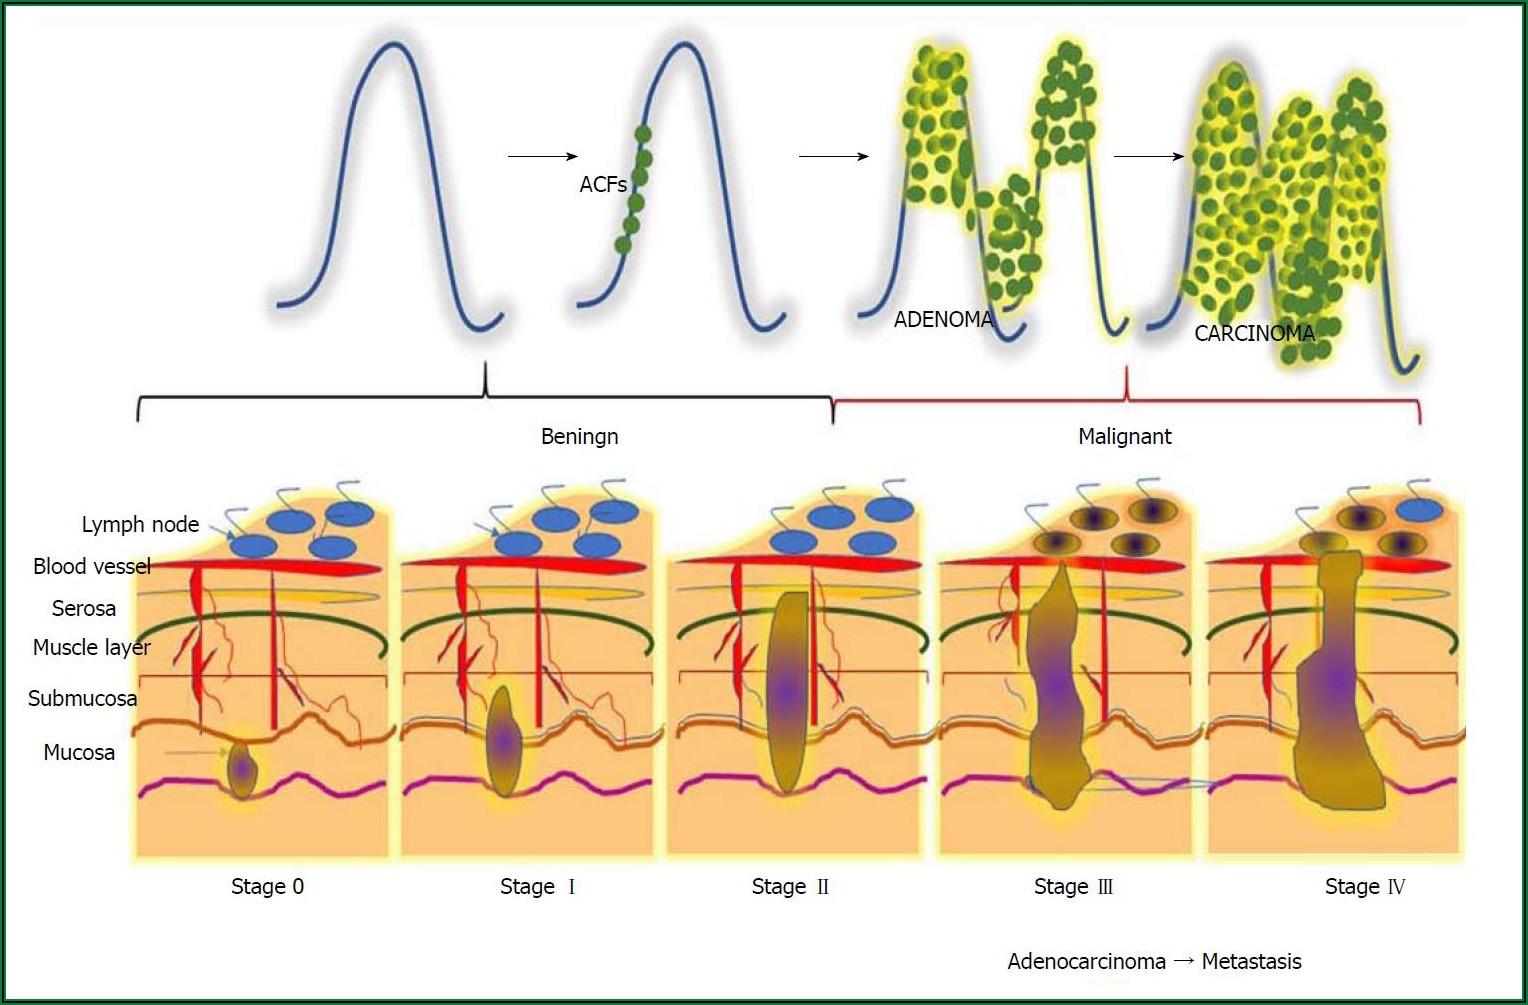 Colon Cancer Development Timeline